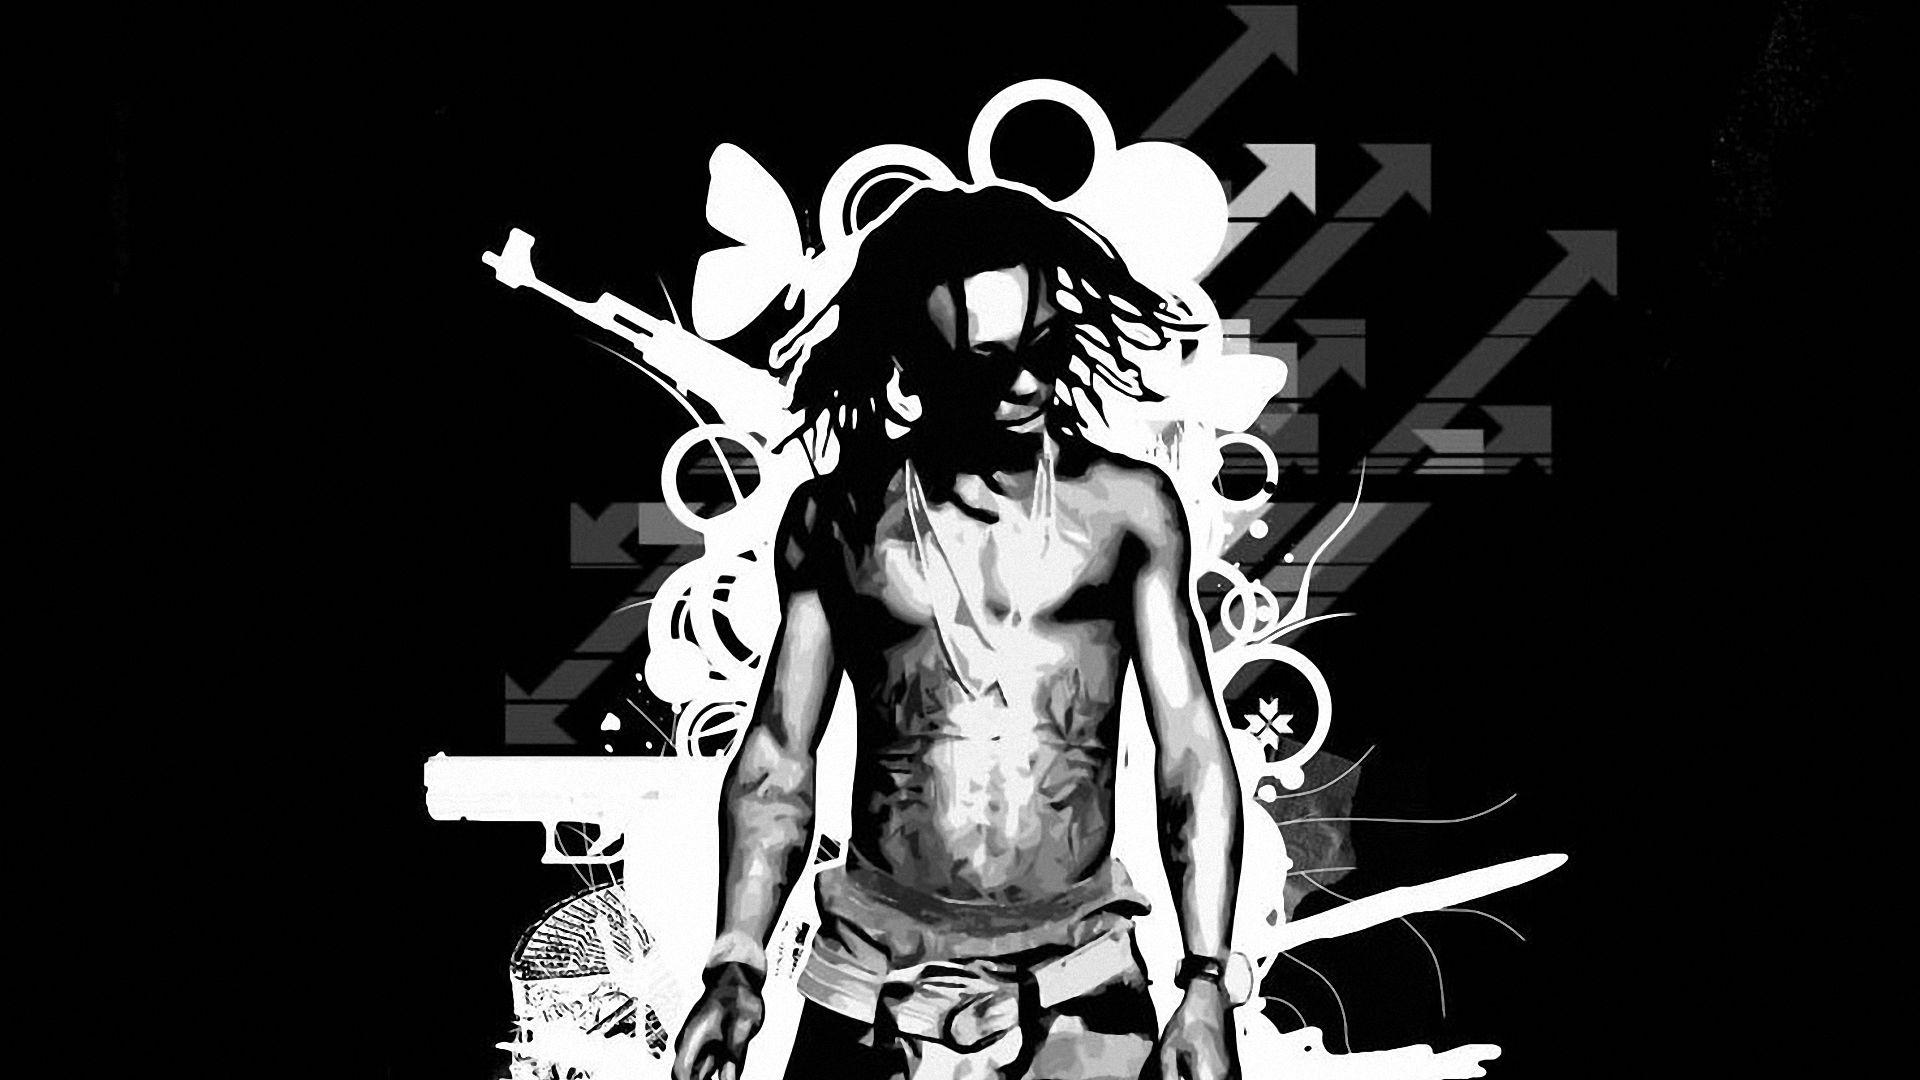 Lil Wayne HD Wallpapers   Wallpaper High Definition High Quality 1920x1080